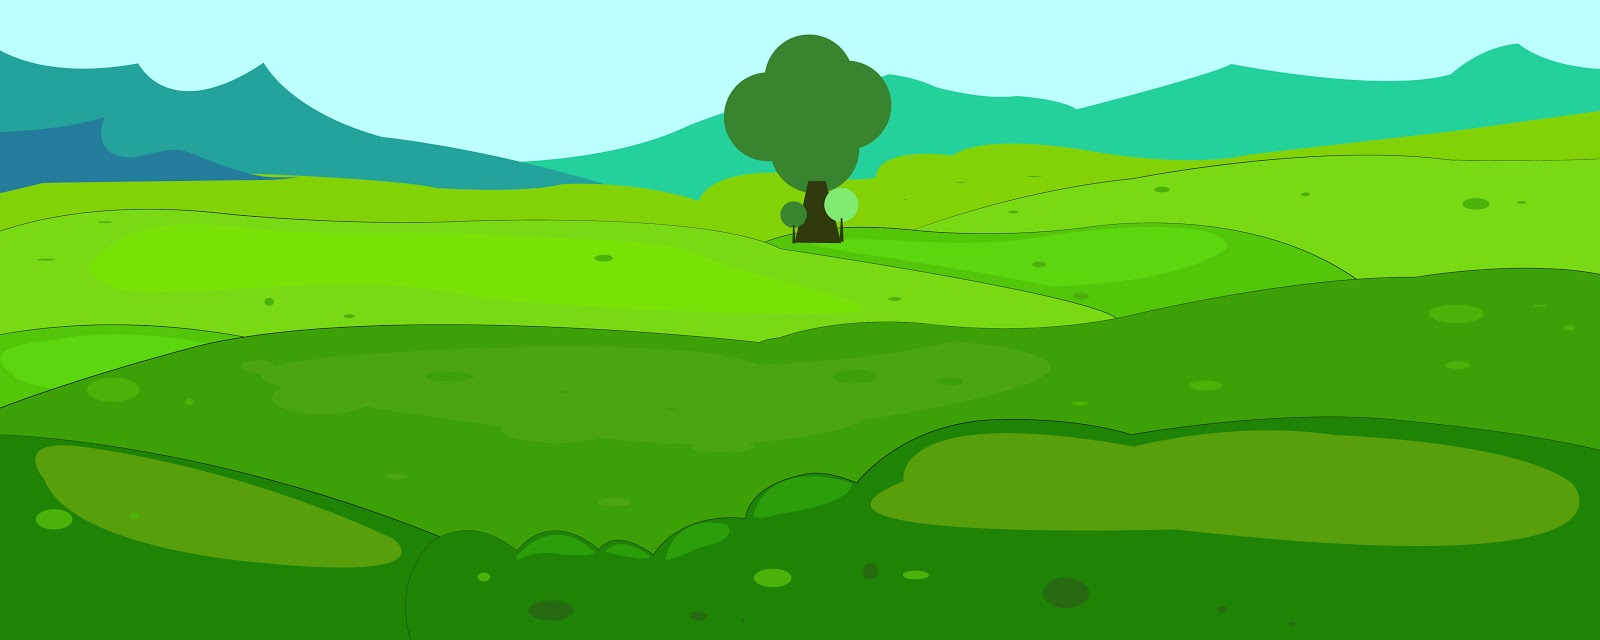 cartoon landscape clipart - photo #36